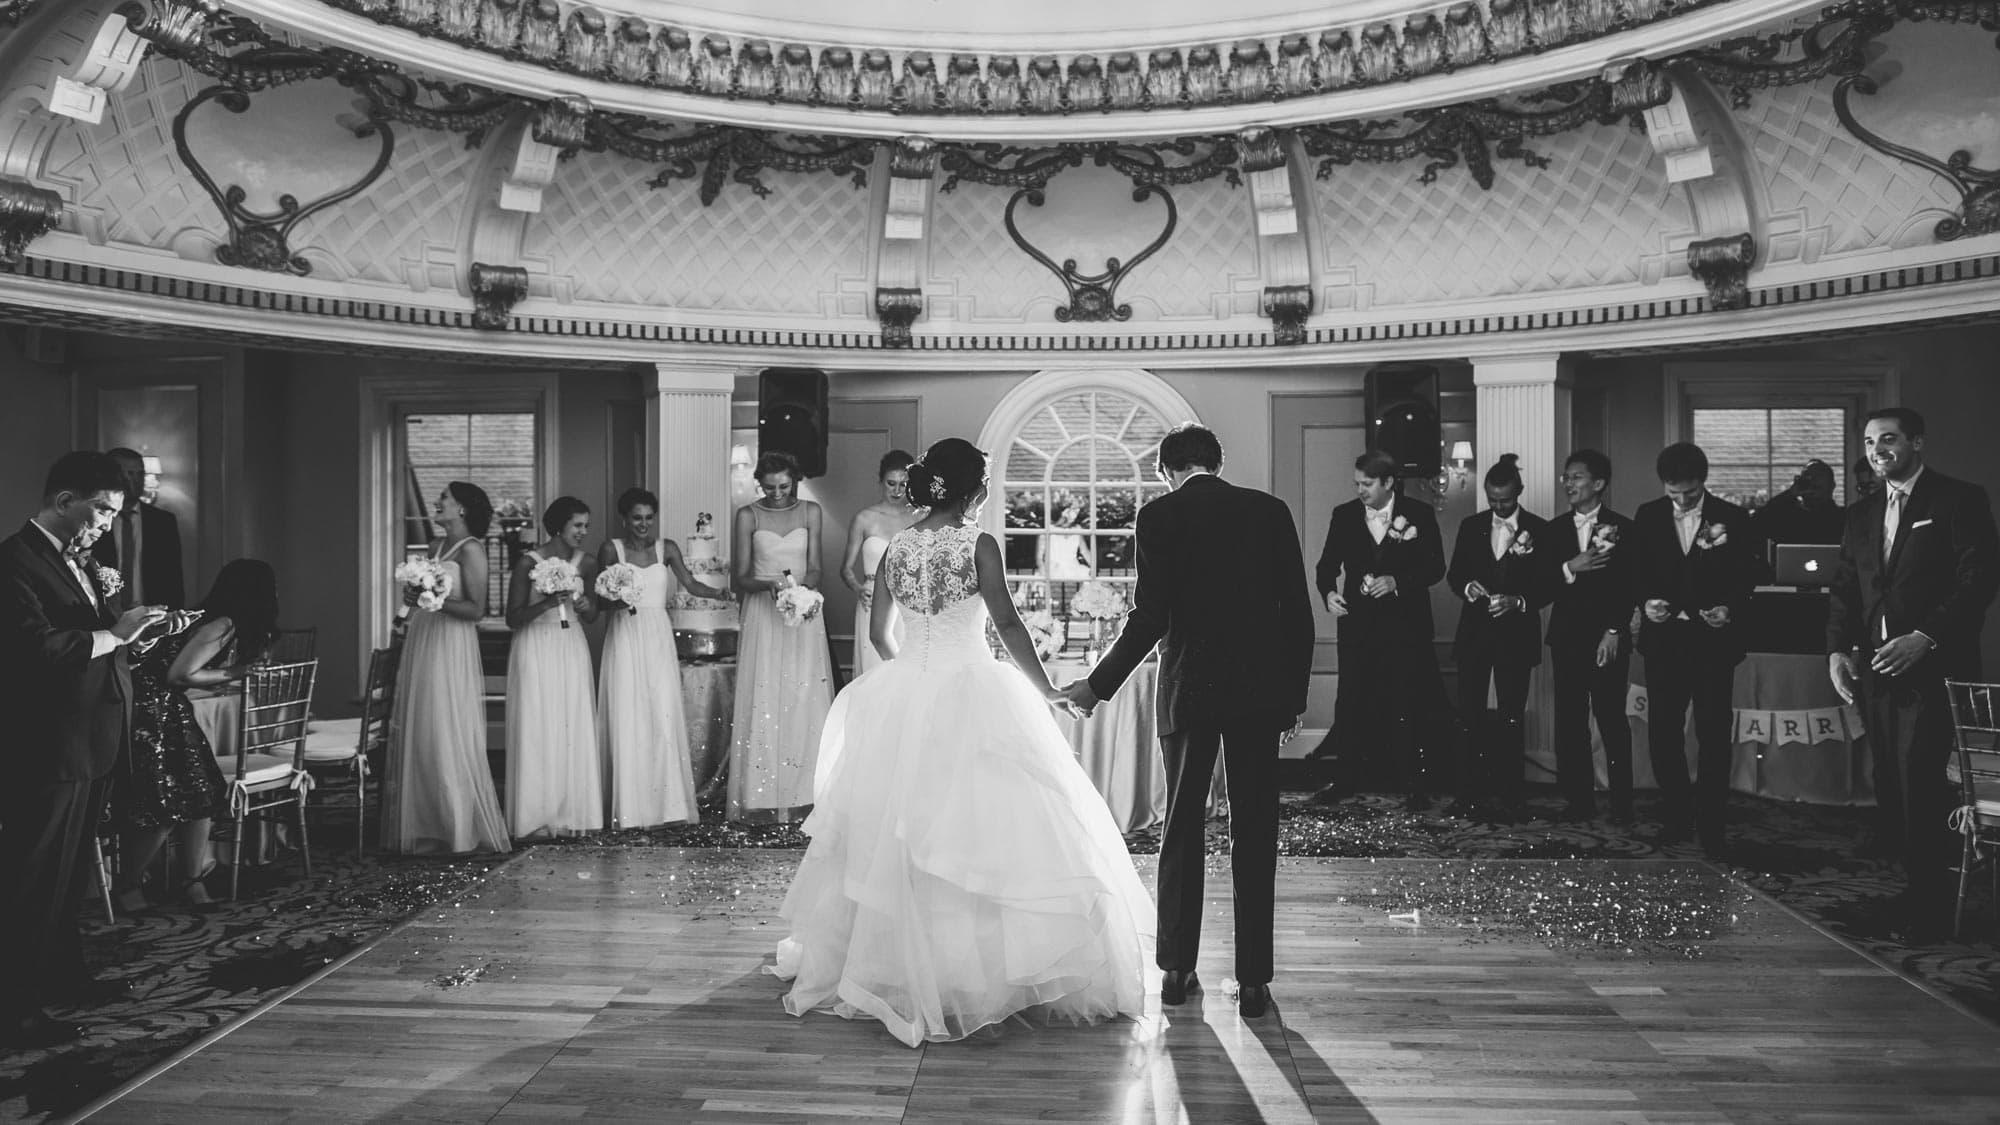 Real Weddings Boston: Real Weddings Sarah & Philipp